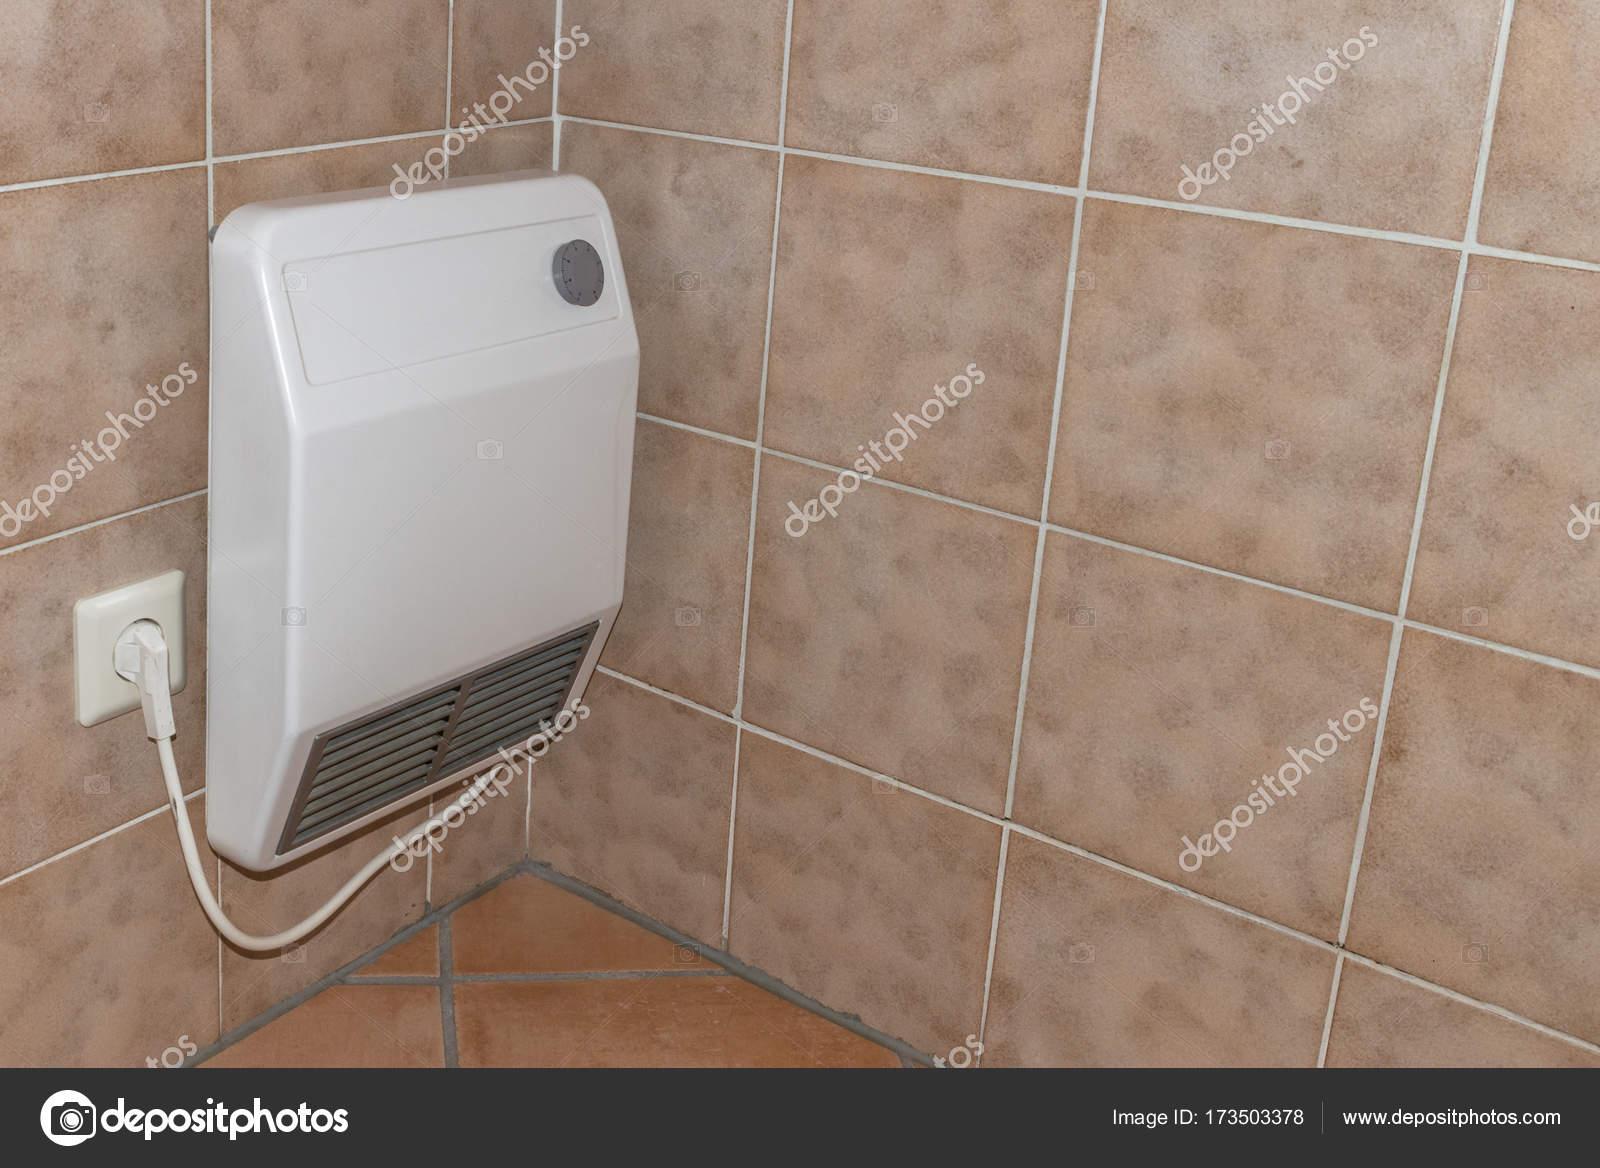 Elektrische Badkamer Verwarming : Vintage oude elektrische verwarming in een badkamer u stockfoto